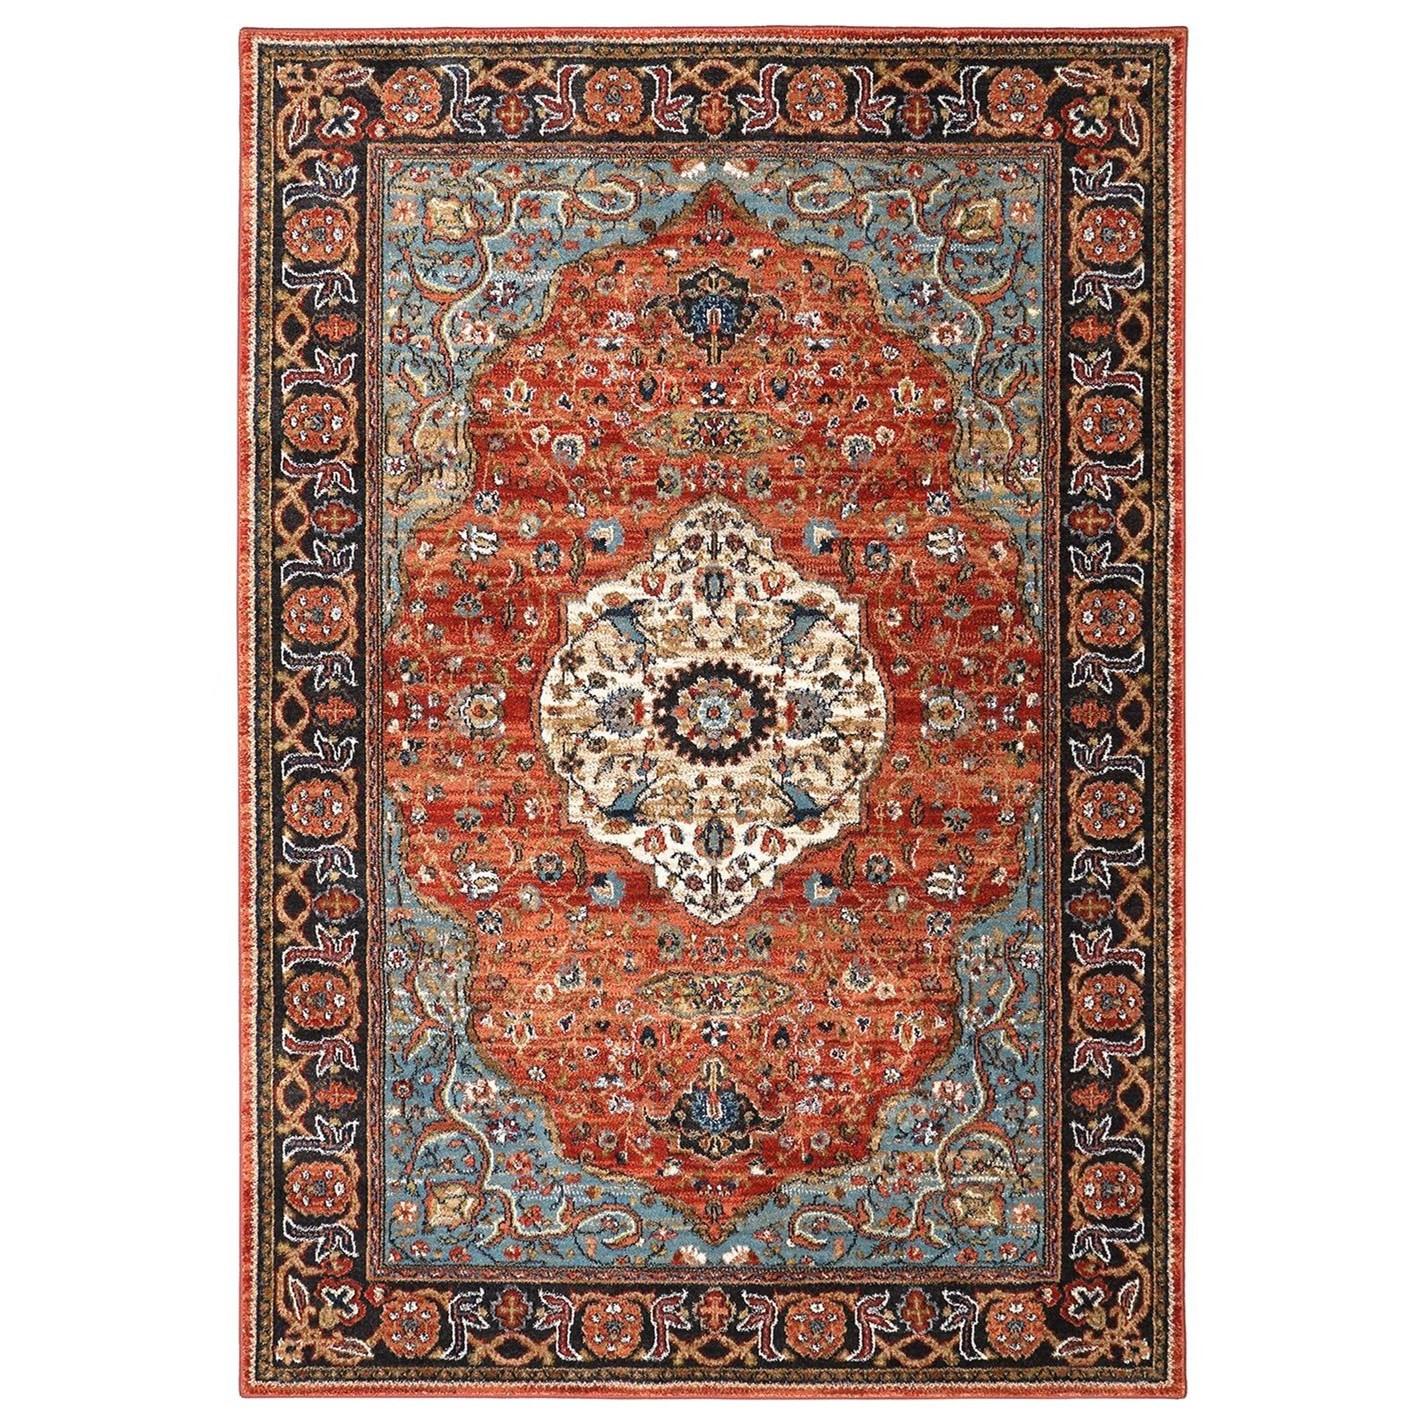 Spice Market 3'5x5'5 Petra Multi Rug by Karastan Rugs at Darvin Furniture